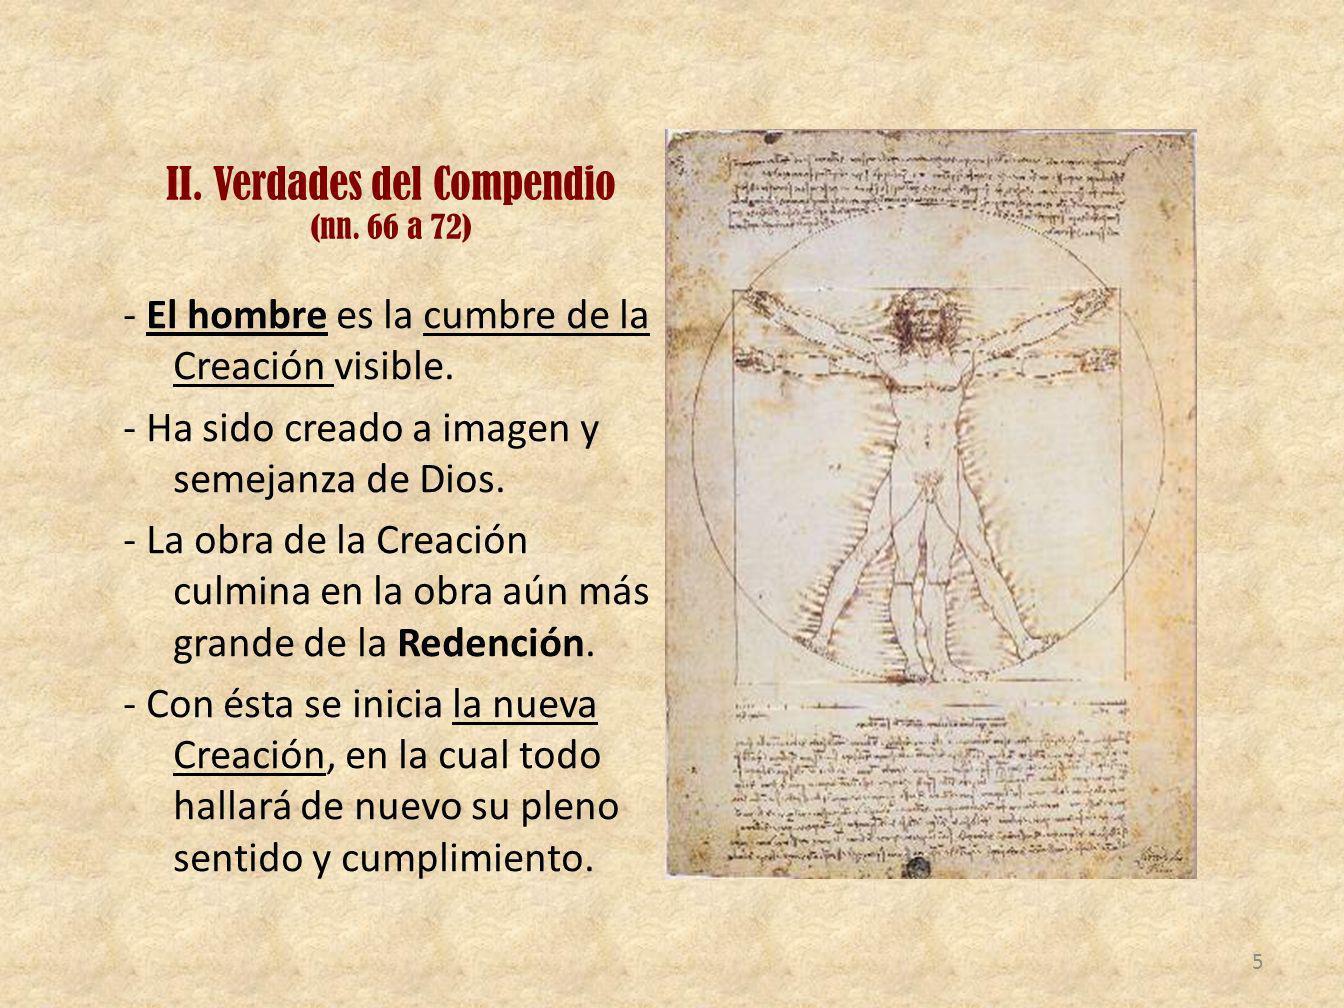 II. Verdades del Compendio (nn. 66 a 72)